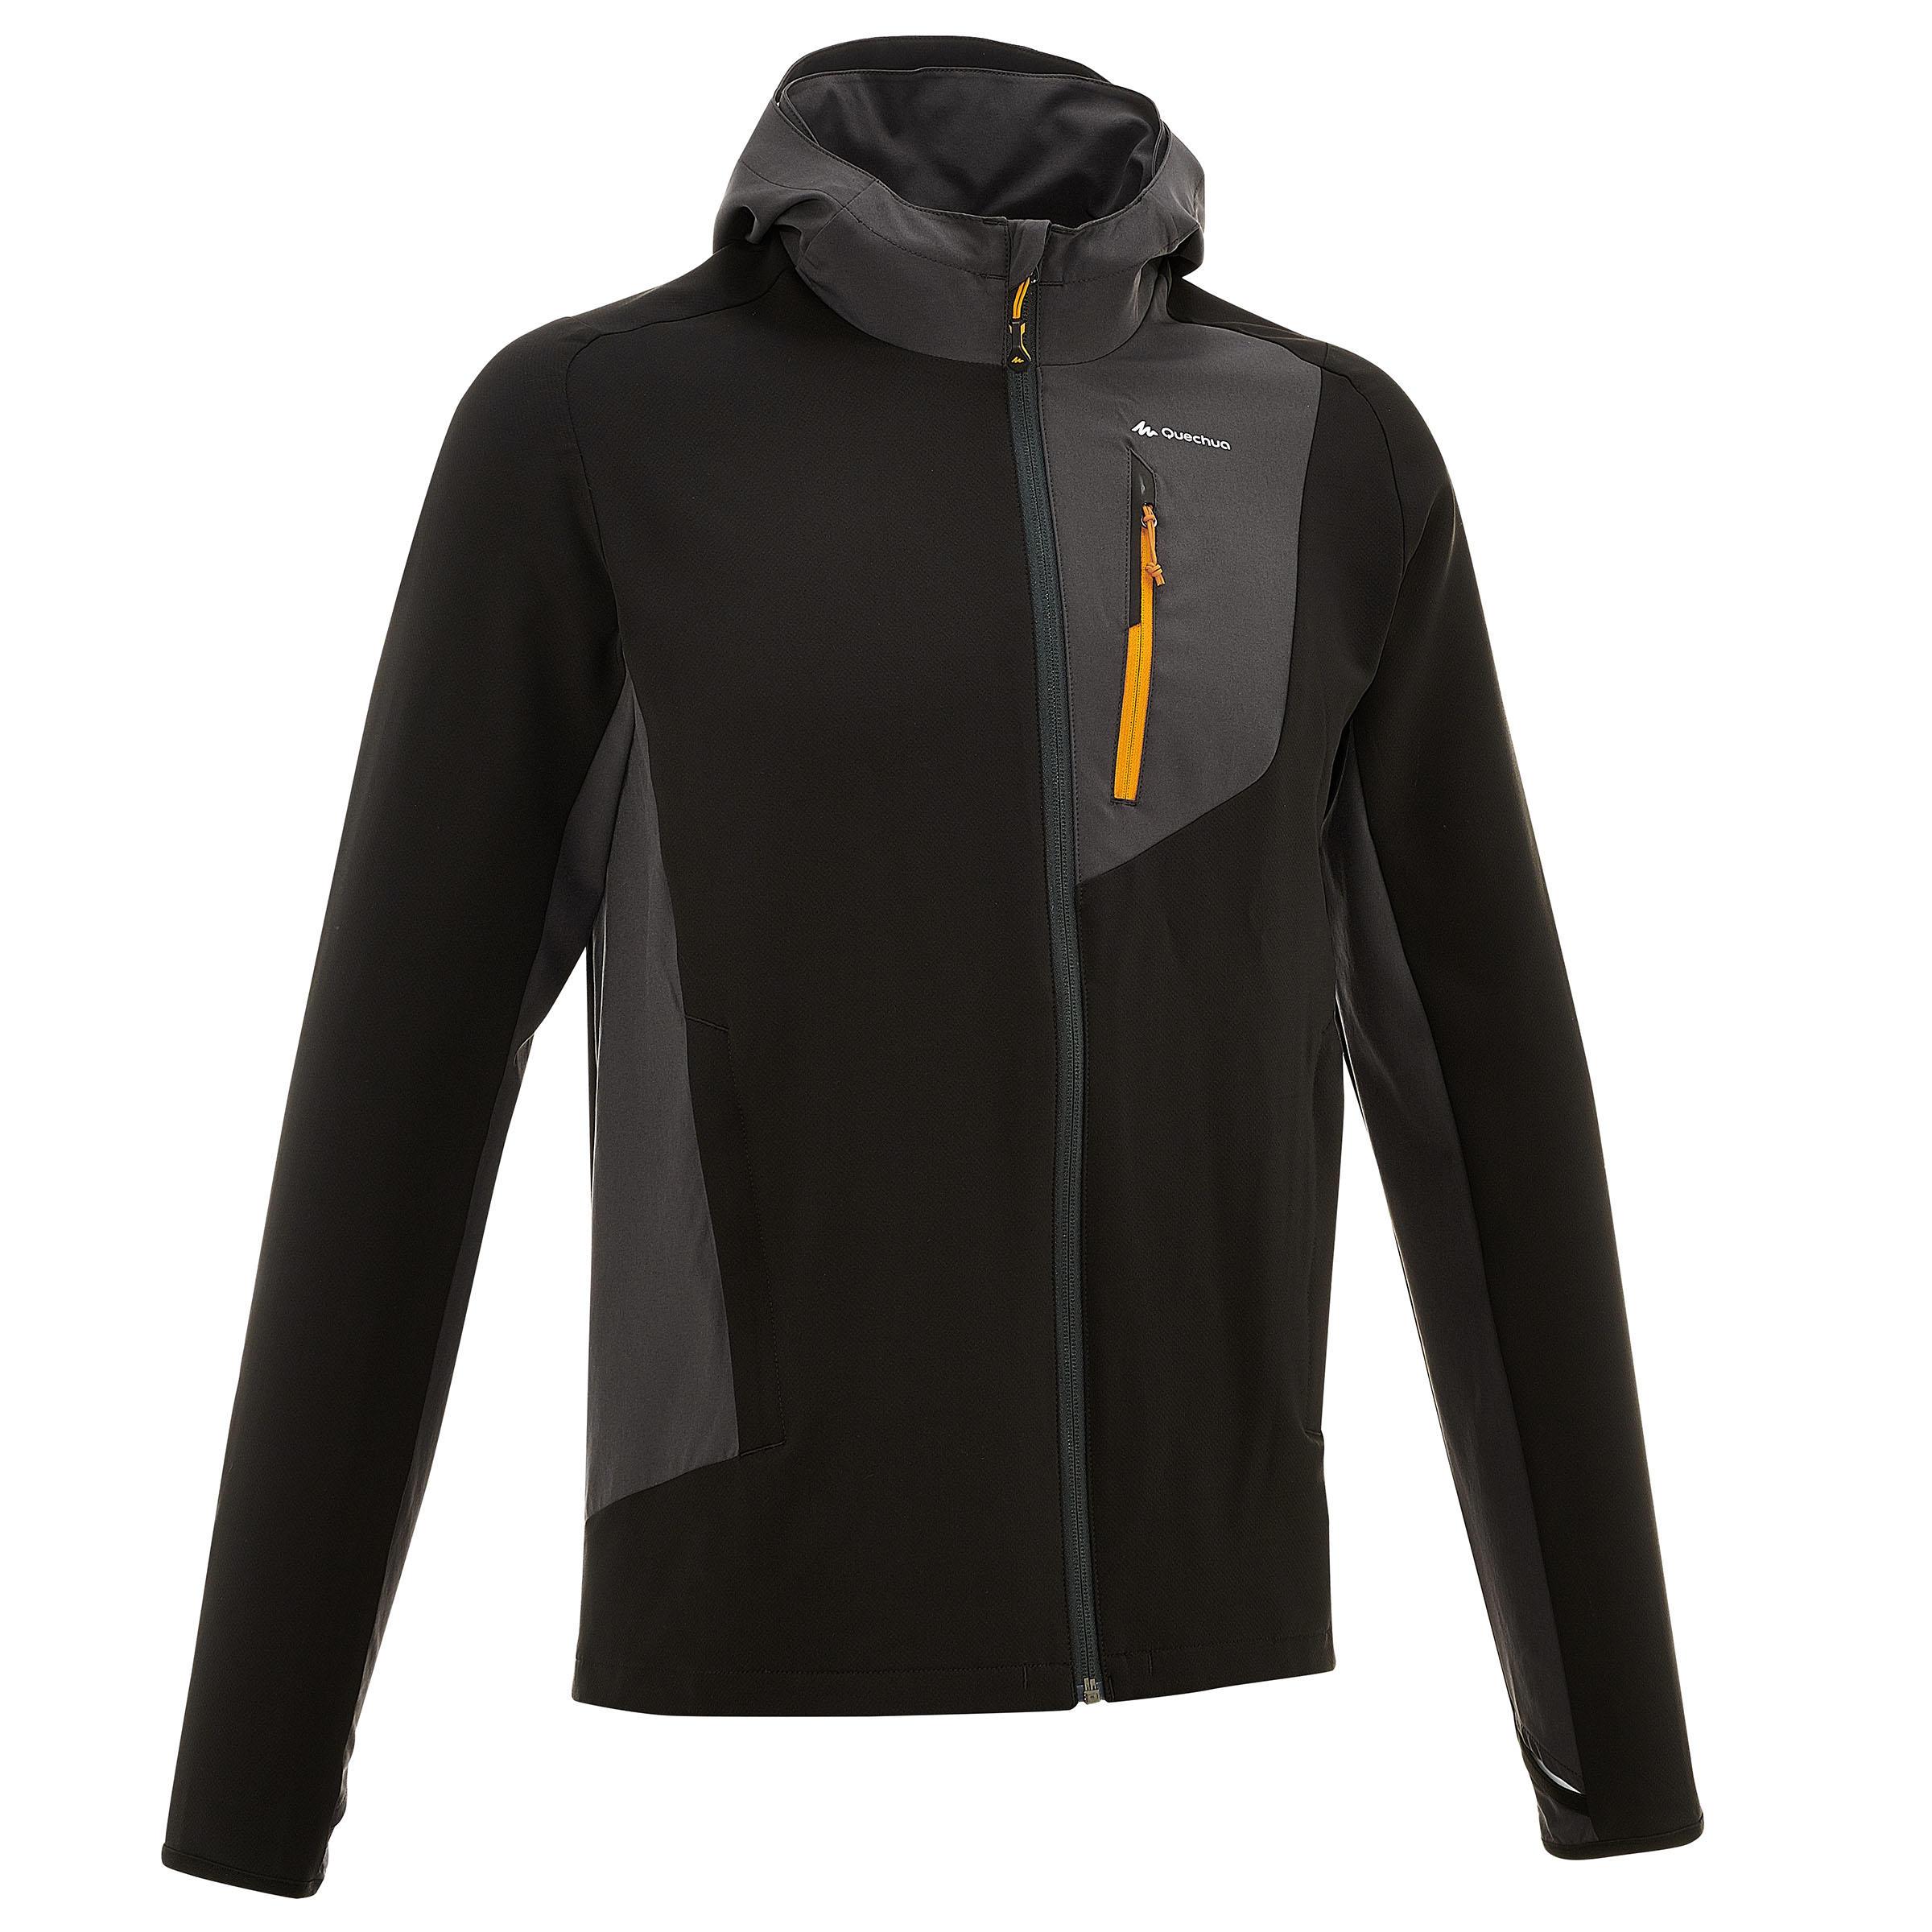 Windjacke Trek 900 Herren schwarz   Sportbekleidung > Sportjacken > Windbreaker   Grau - Schwarz   Quechua